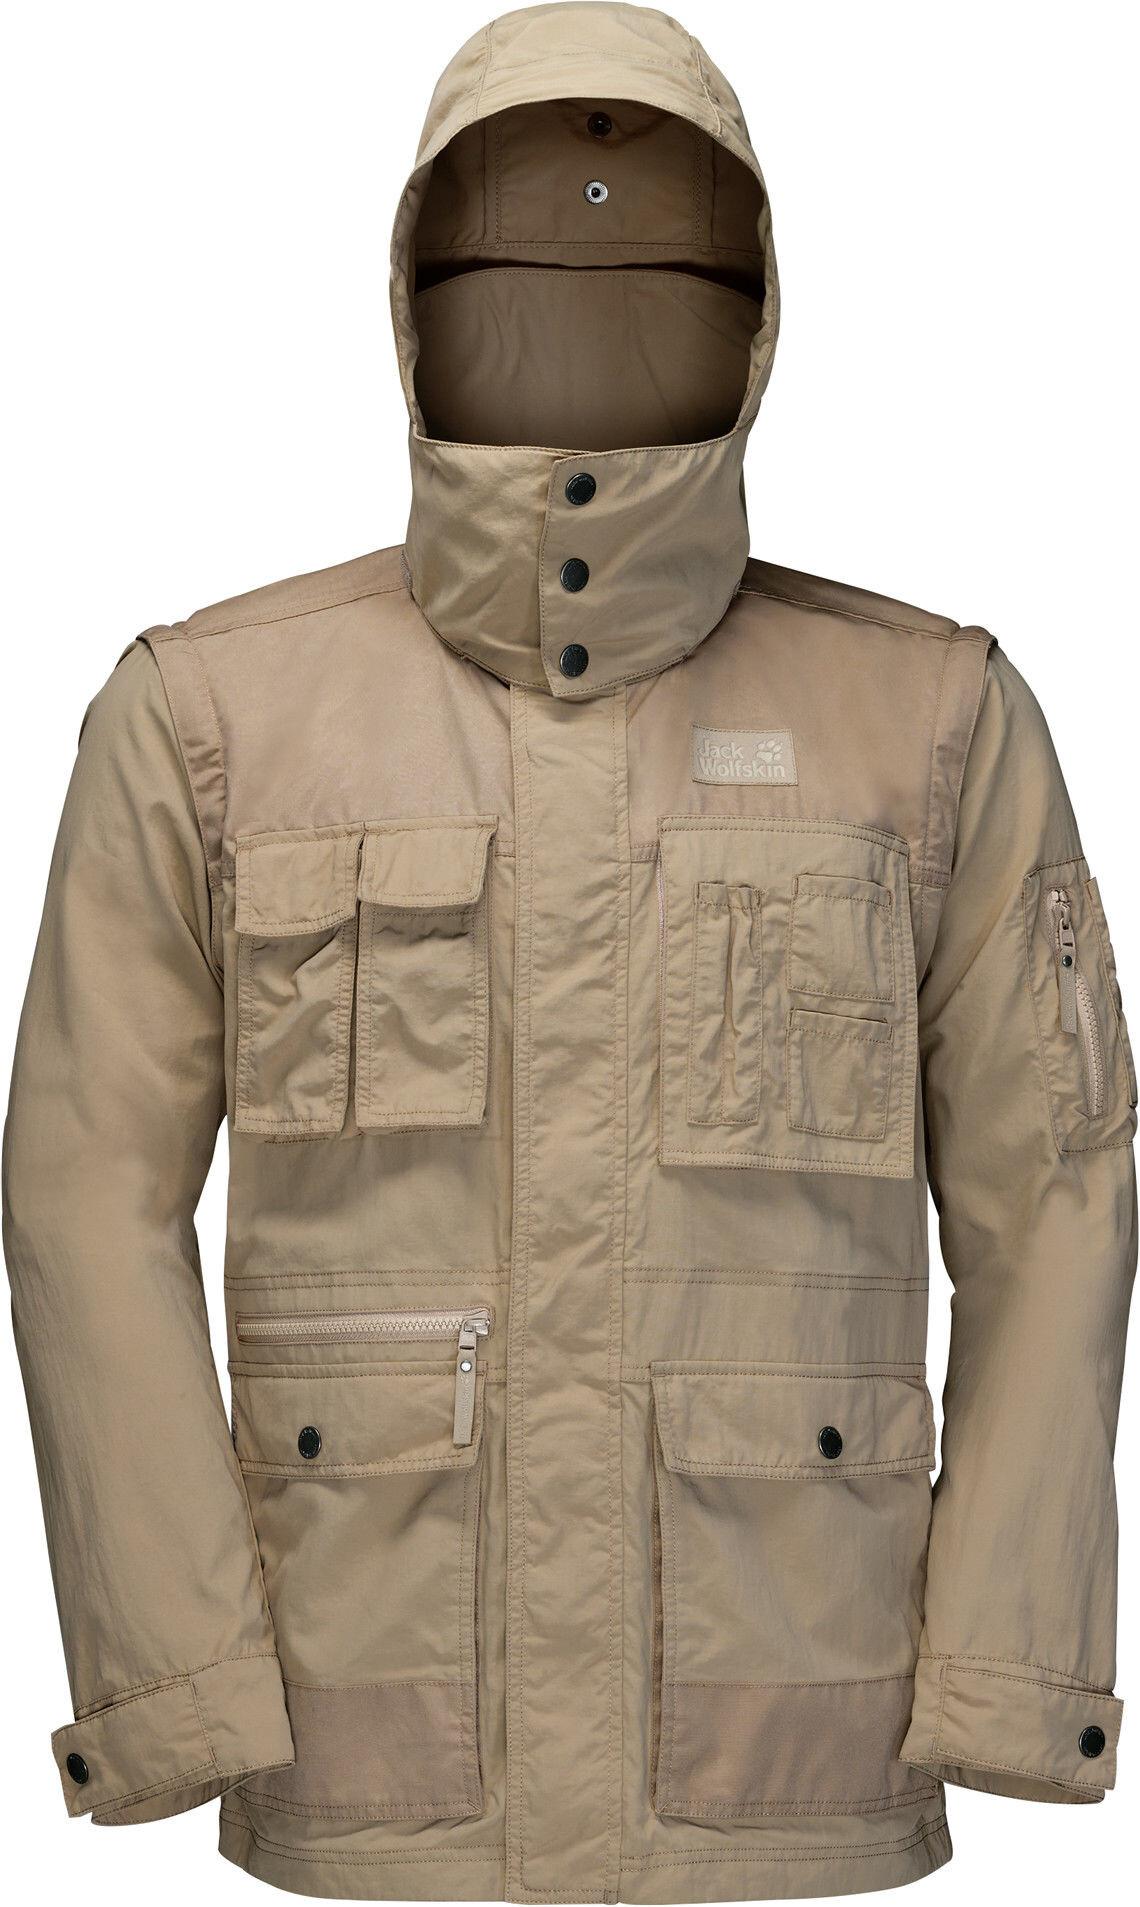 Jack Wolfskin Atacama - Veste Homme - beige sur CAMPZ ! 90aeda039556